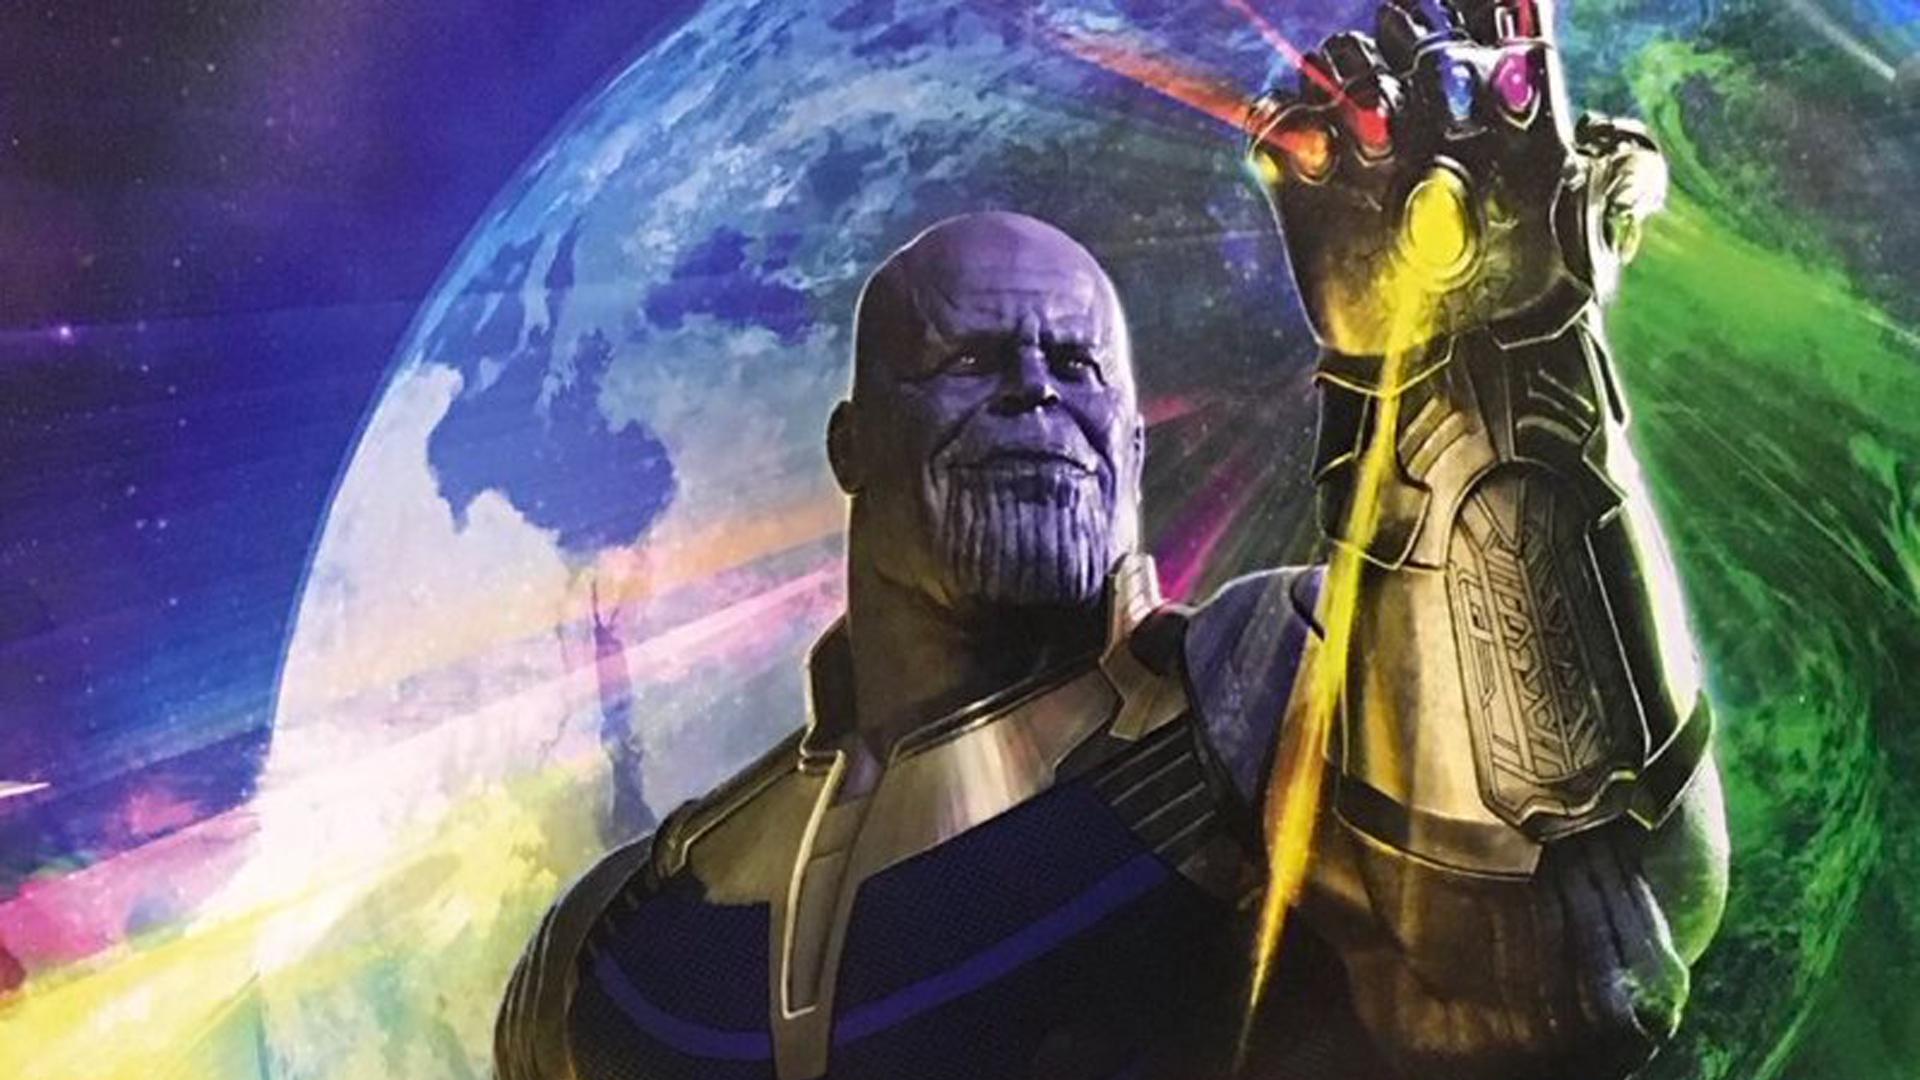 Most Inspiring Scott Lang Infinity War Wallpaper - infinity-war-poster-thanos-hero  2018_3197 .jpg